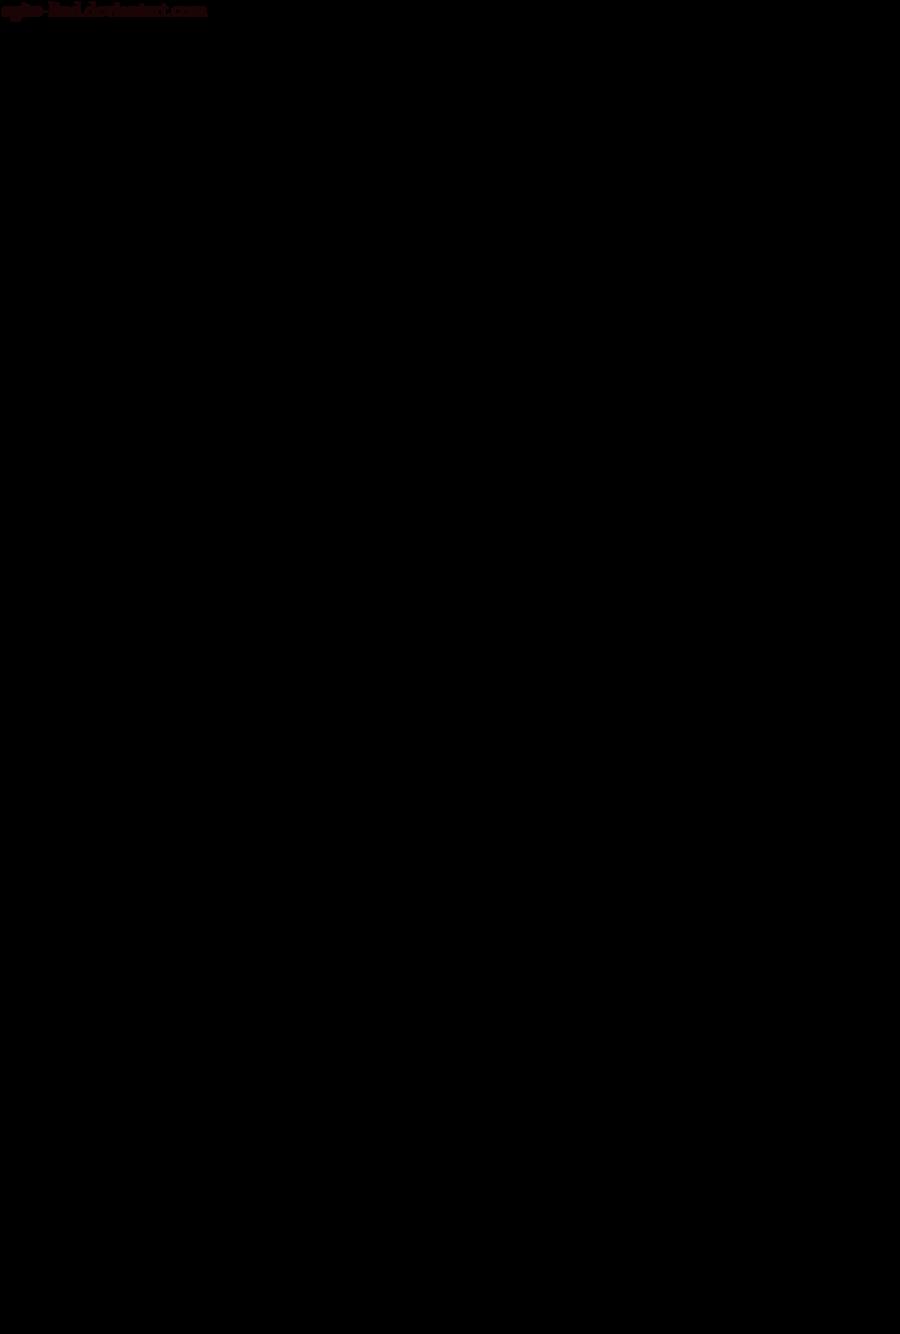 Bleach Toushiro Line By Aagito On Deviantart Anime Character Drawing Bleach Anime Art Bleach Anime Ichigo [ 1334 x 900 Pixel ]